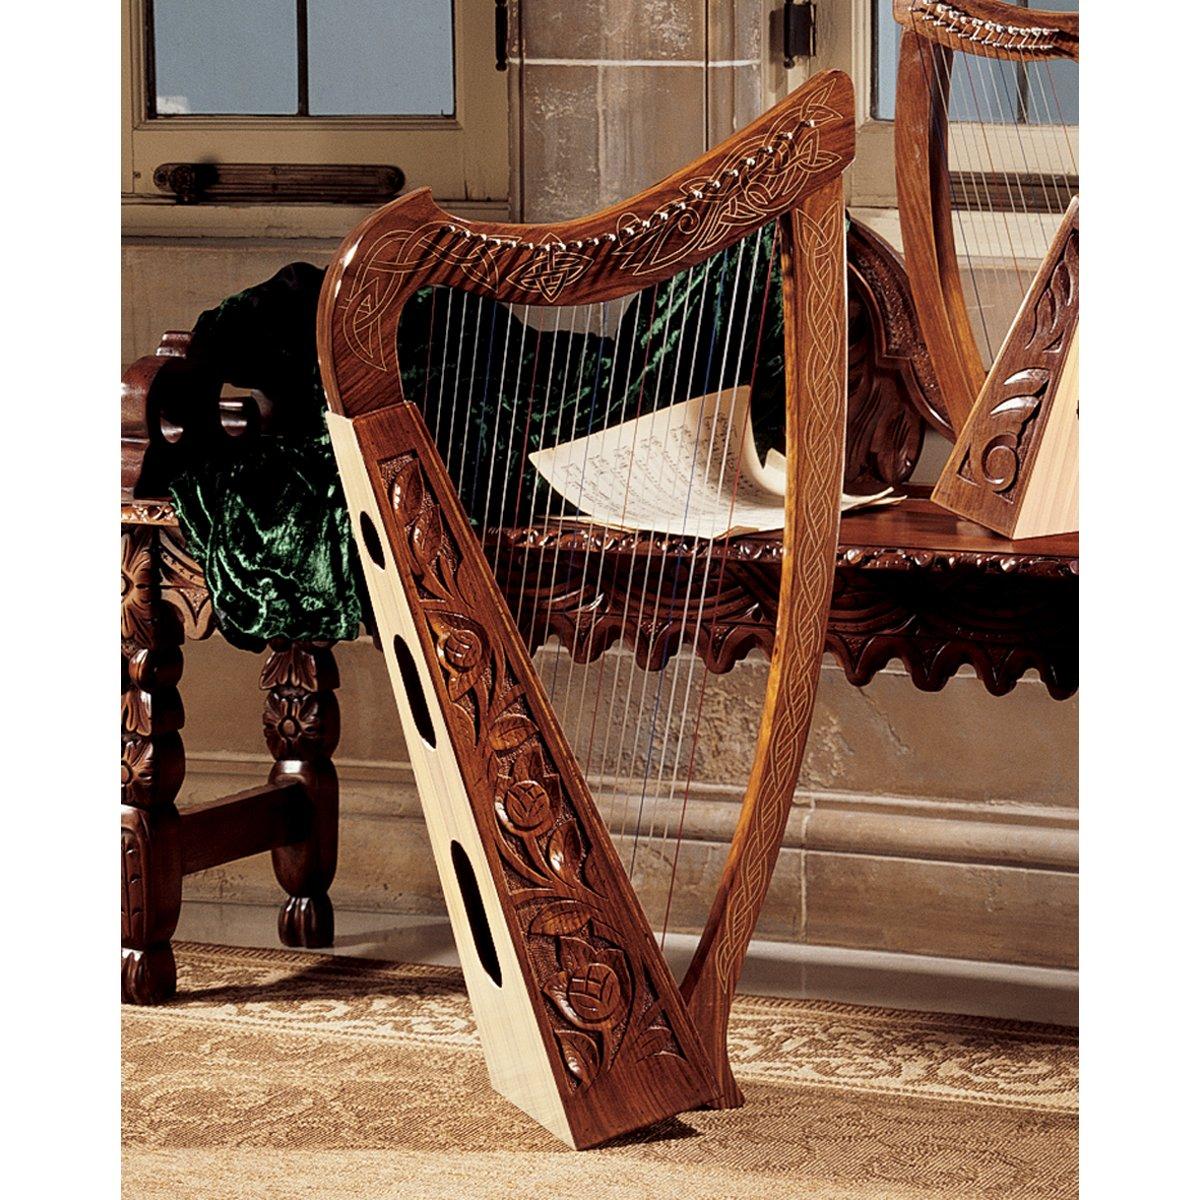 Uncategorized Picture Of A Harp amazon com design toscano celtic heather harp harps musical instruments